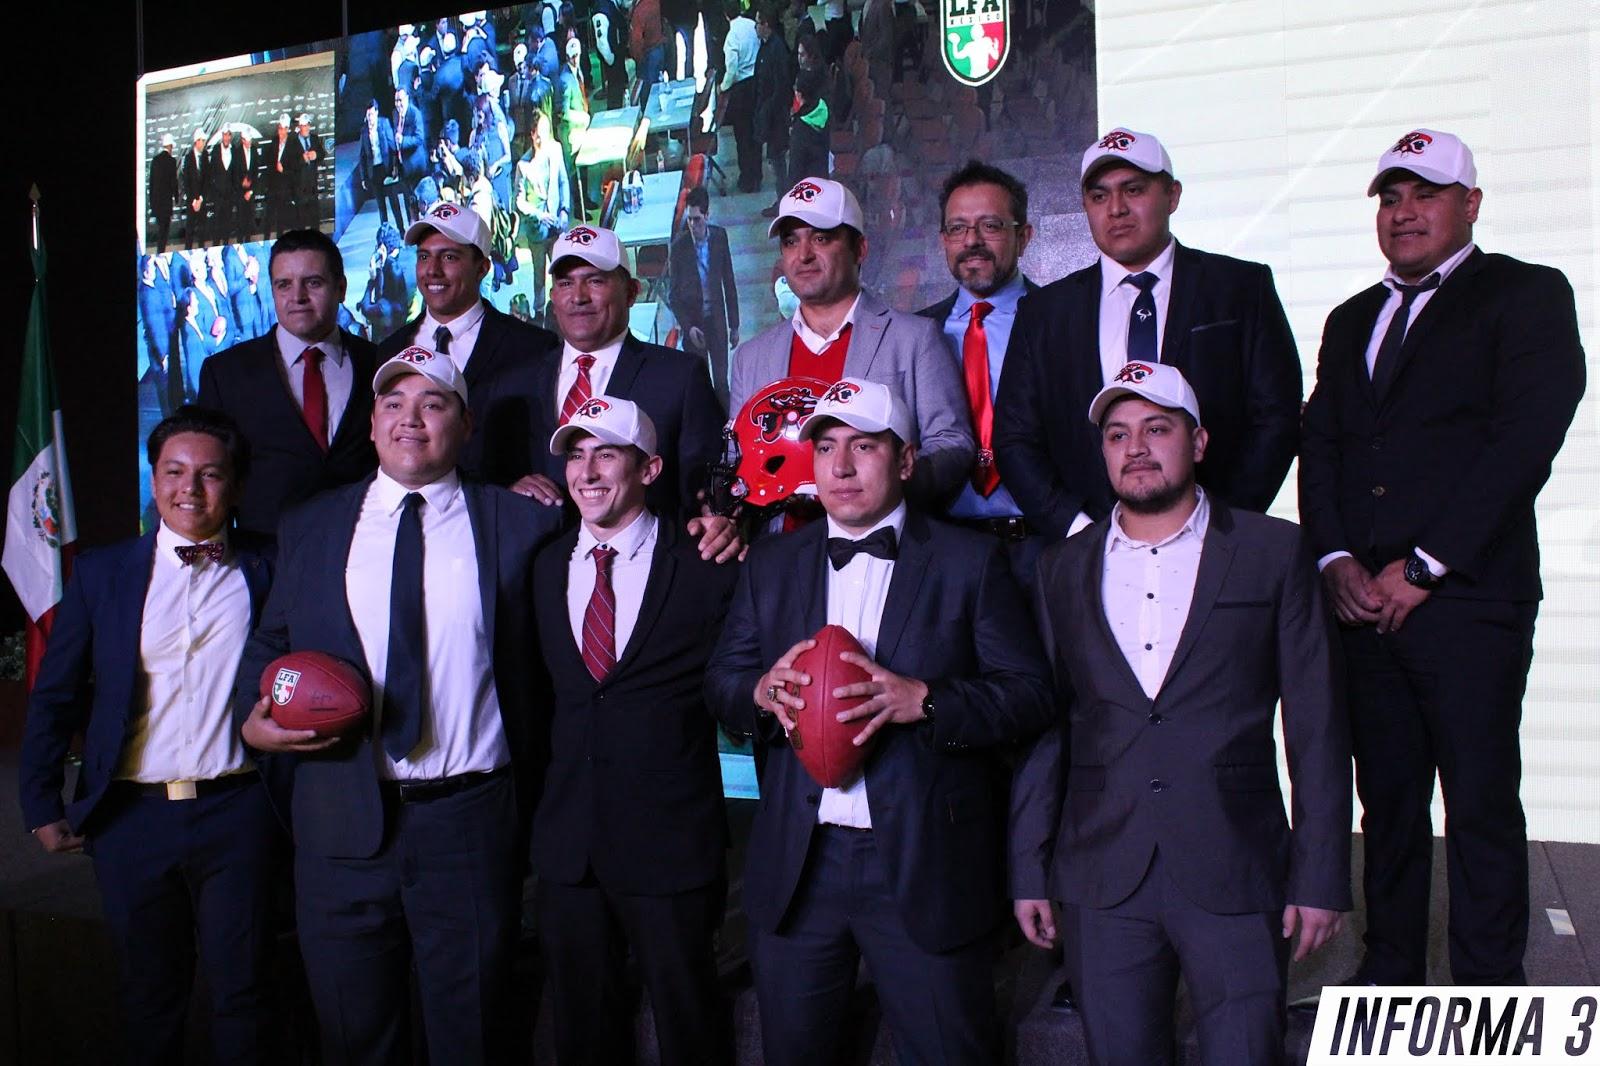 Jugadores seleccionados por Mexicas, Draft LFA 2019